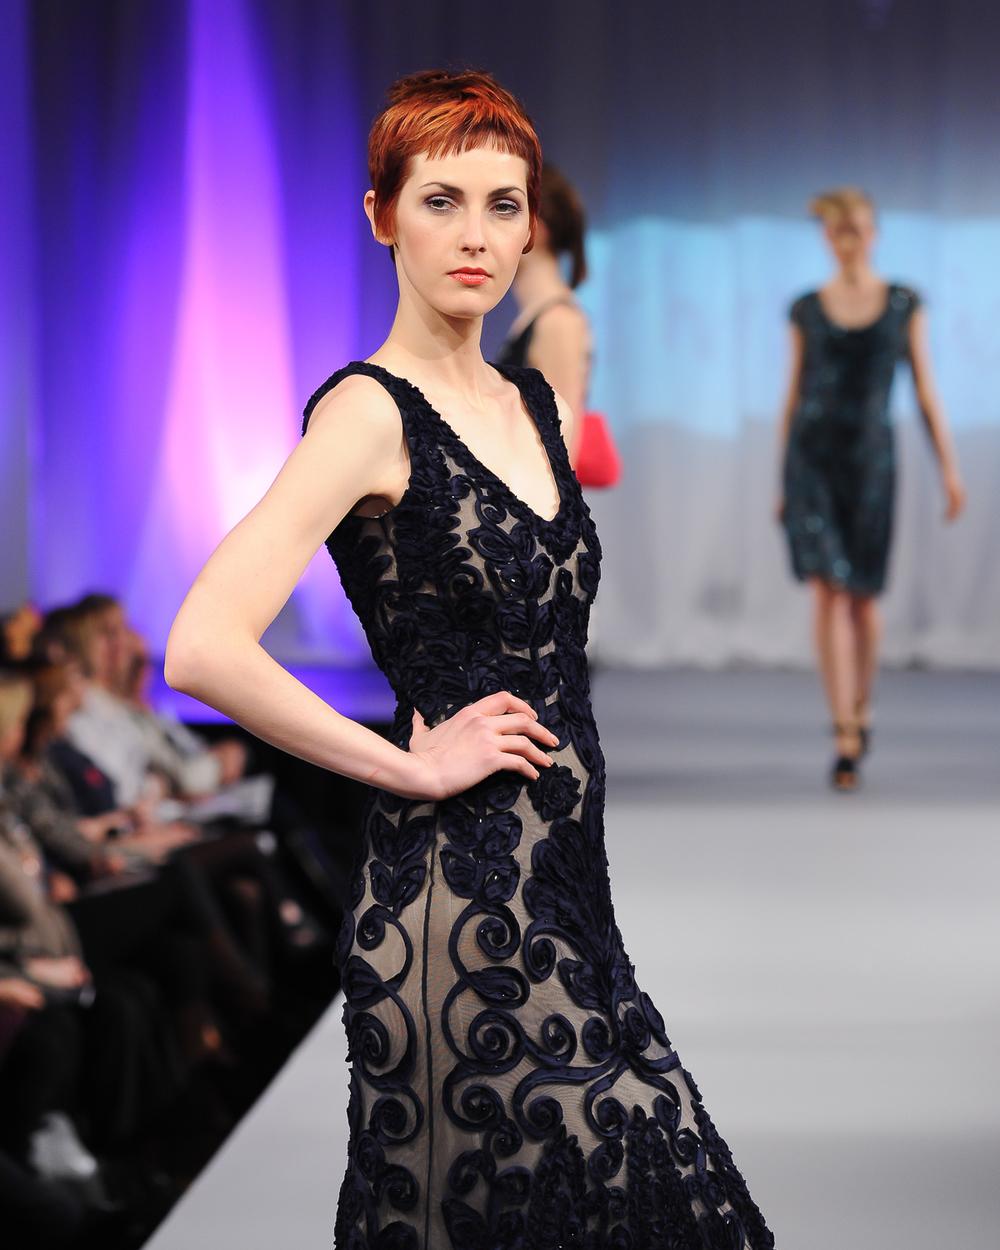 bristol-fashion-photographer-16.jpg